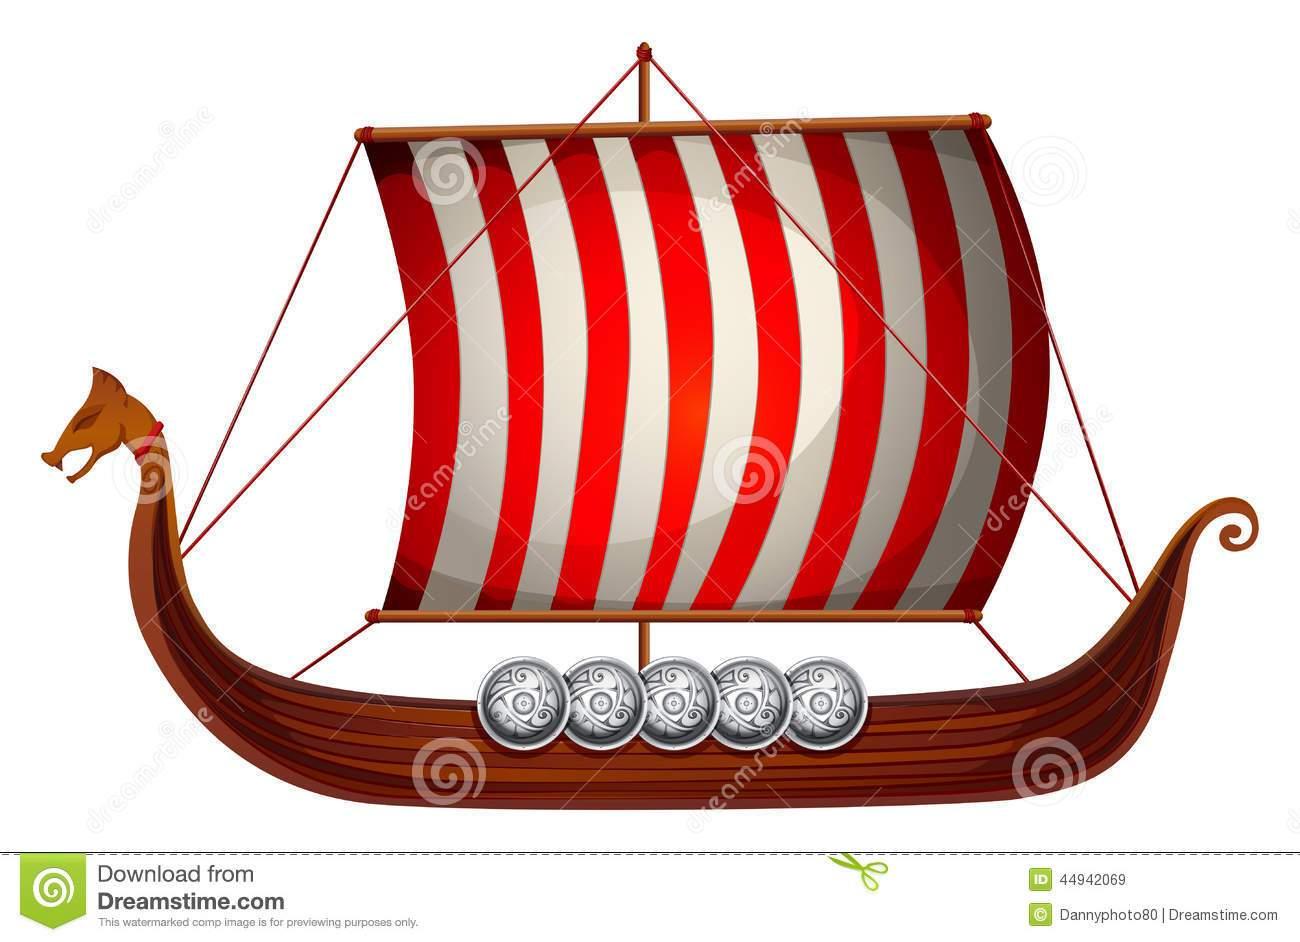 dragon boat clip art vector dragon boat 330 graphics clipart me.